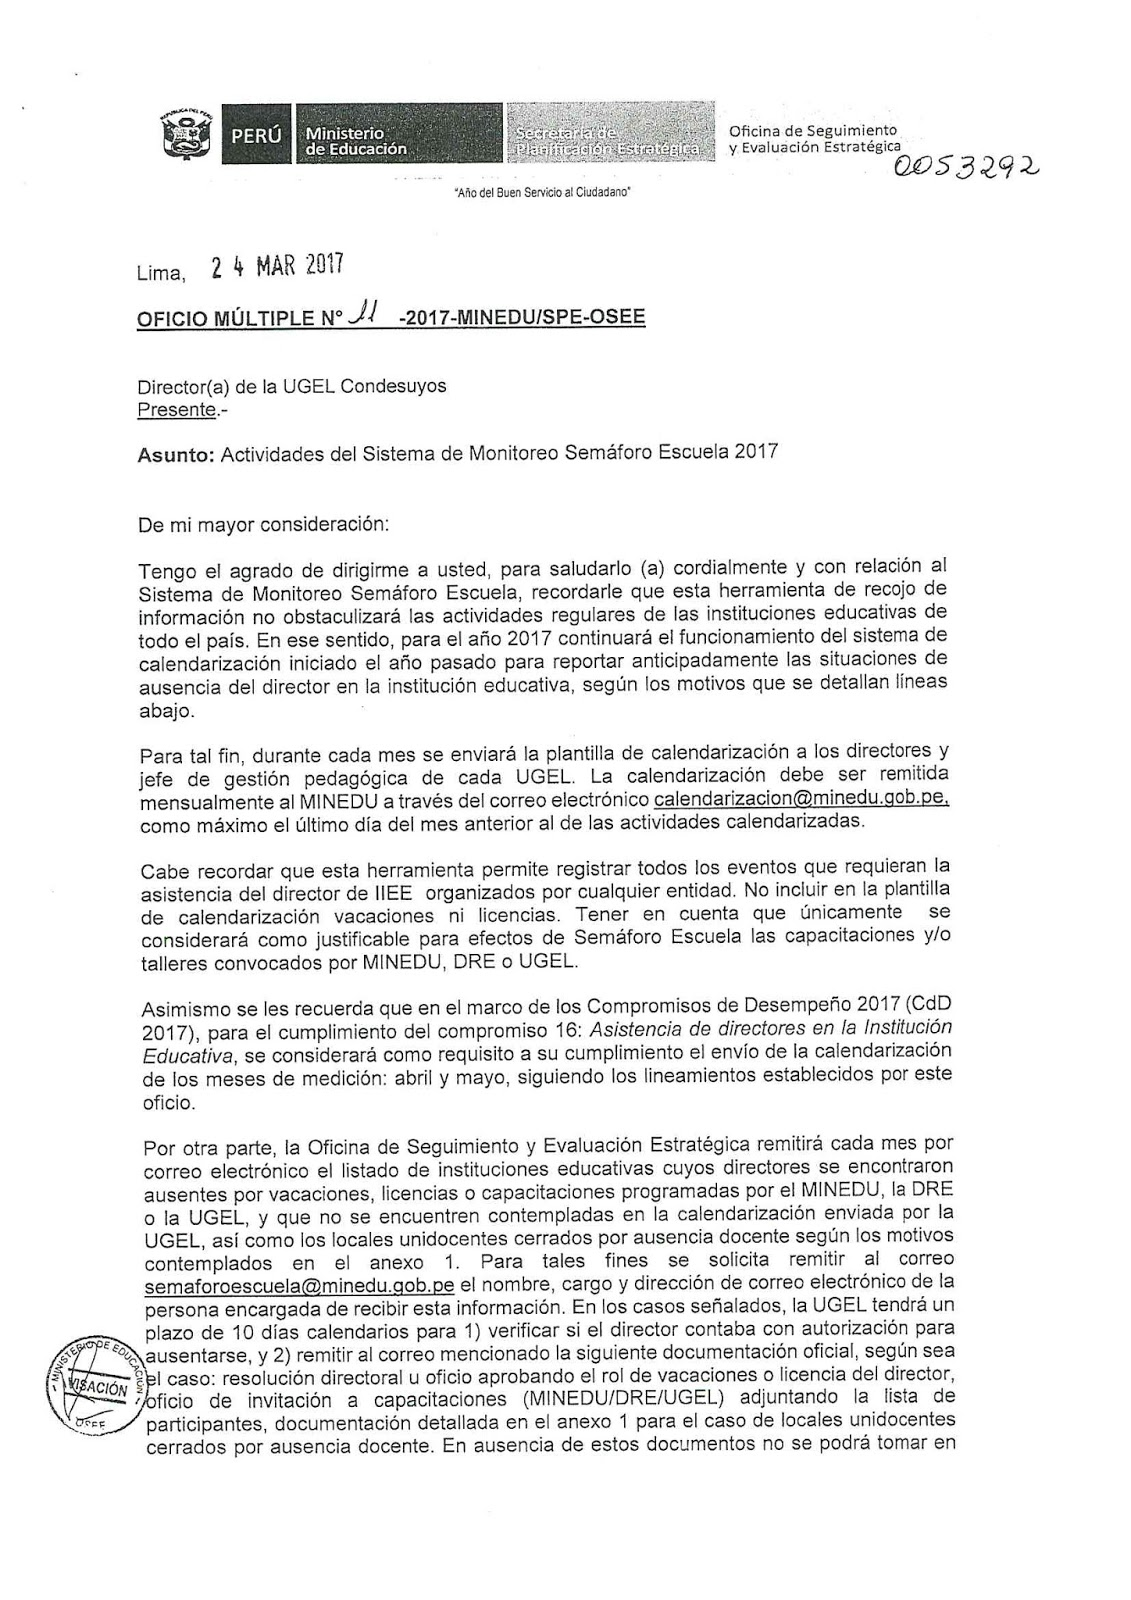 UGEL CONDESUYOS: URGENTE SISTEMA DE MONITOREO SEMAFORO